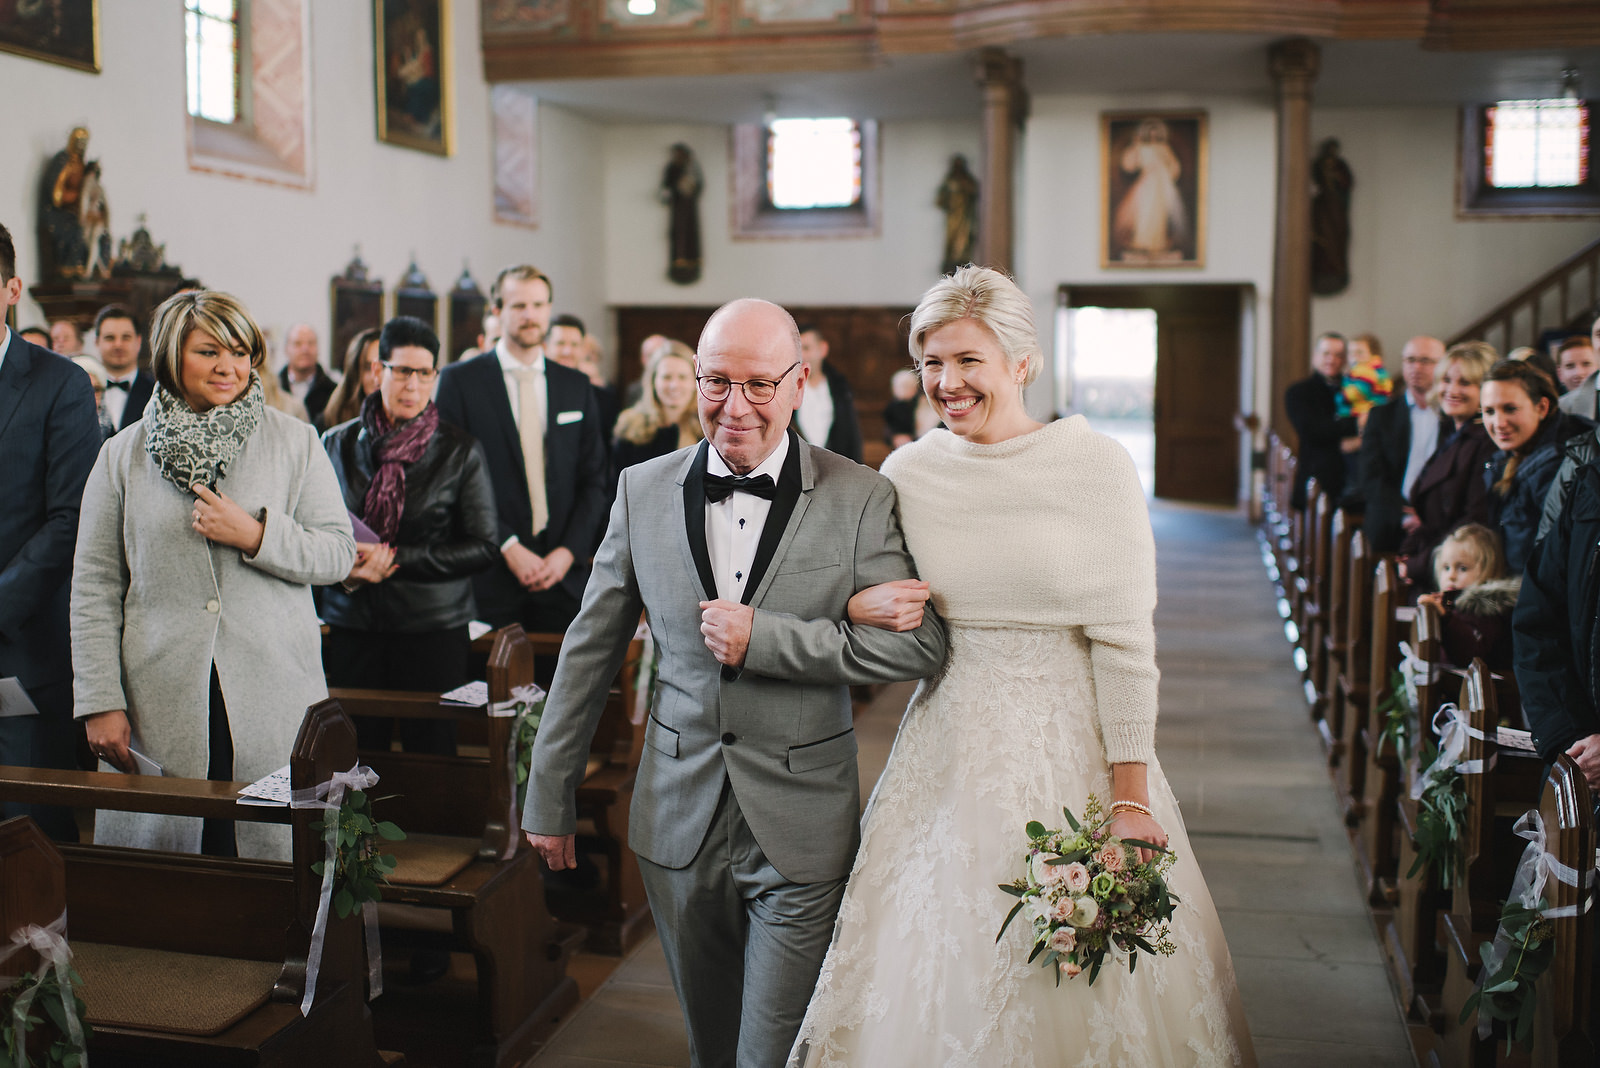 Fotograf Konstanz - Silvester Wedding in Hagnau / Friedrichshafen at Lake of Constance  - 8 -